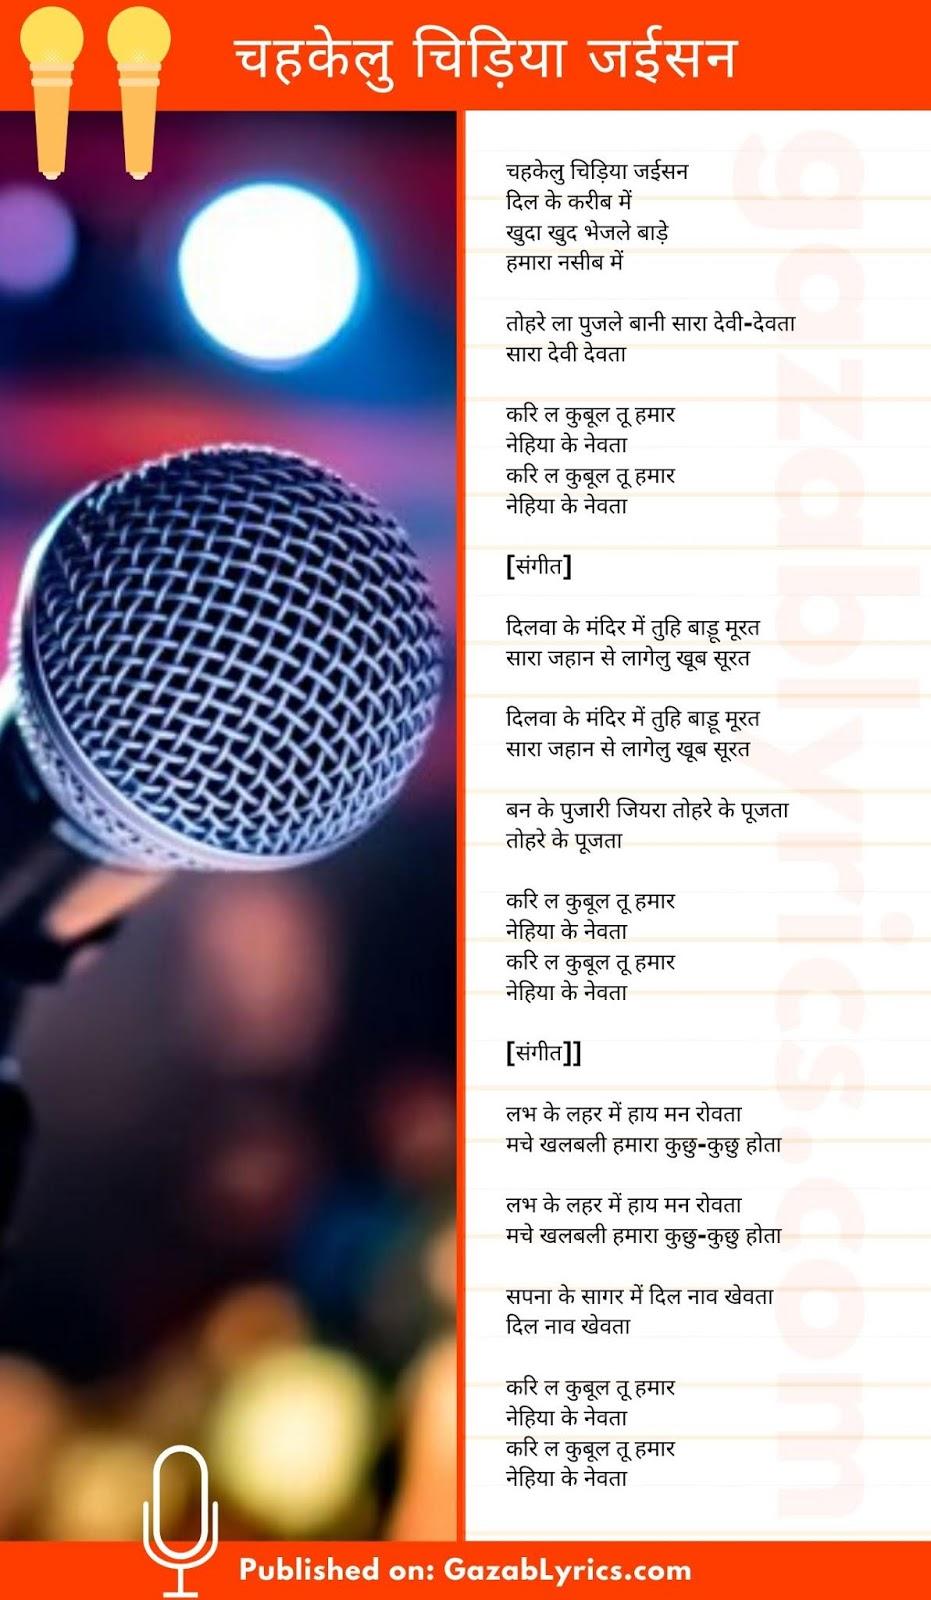 Chahkelu Chidiya Jaisan song lyrics image